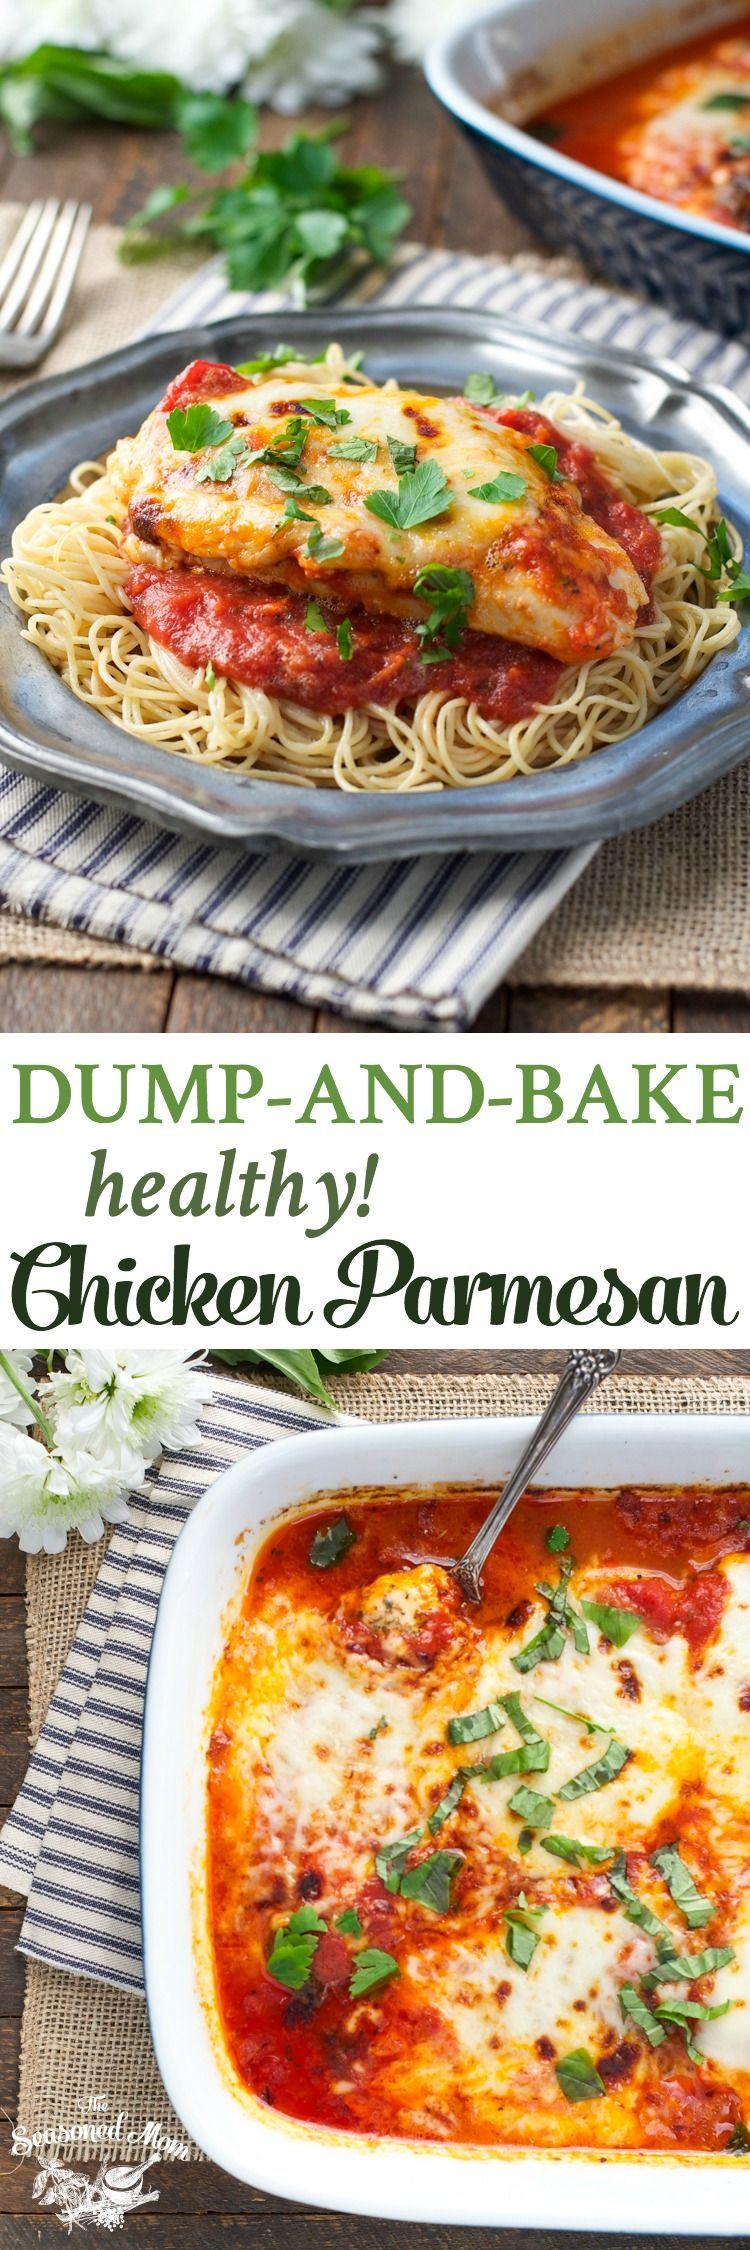 Heart Healthy Chicken Breast Recipes  Dump and Bake Healthy Chicken Parmesan Recipe